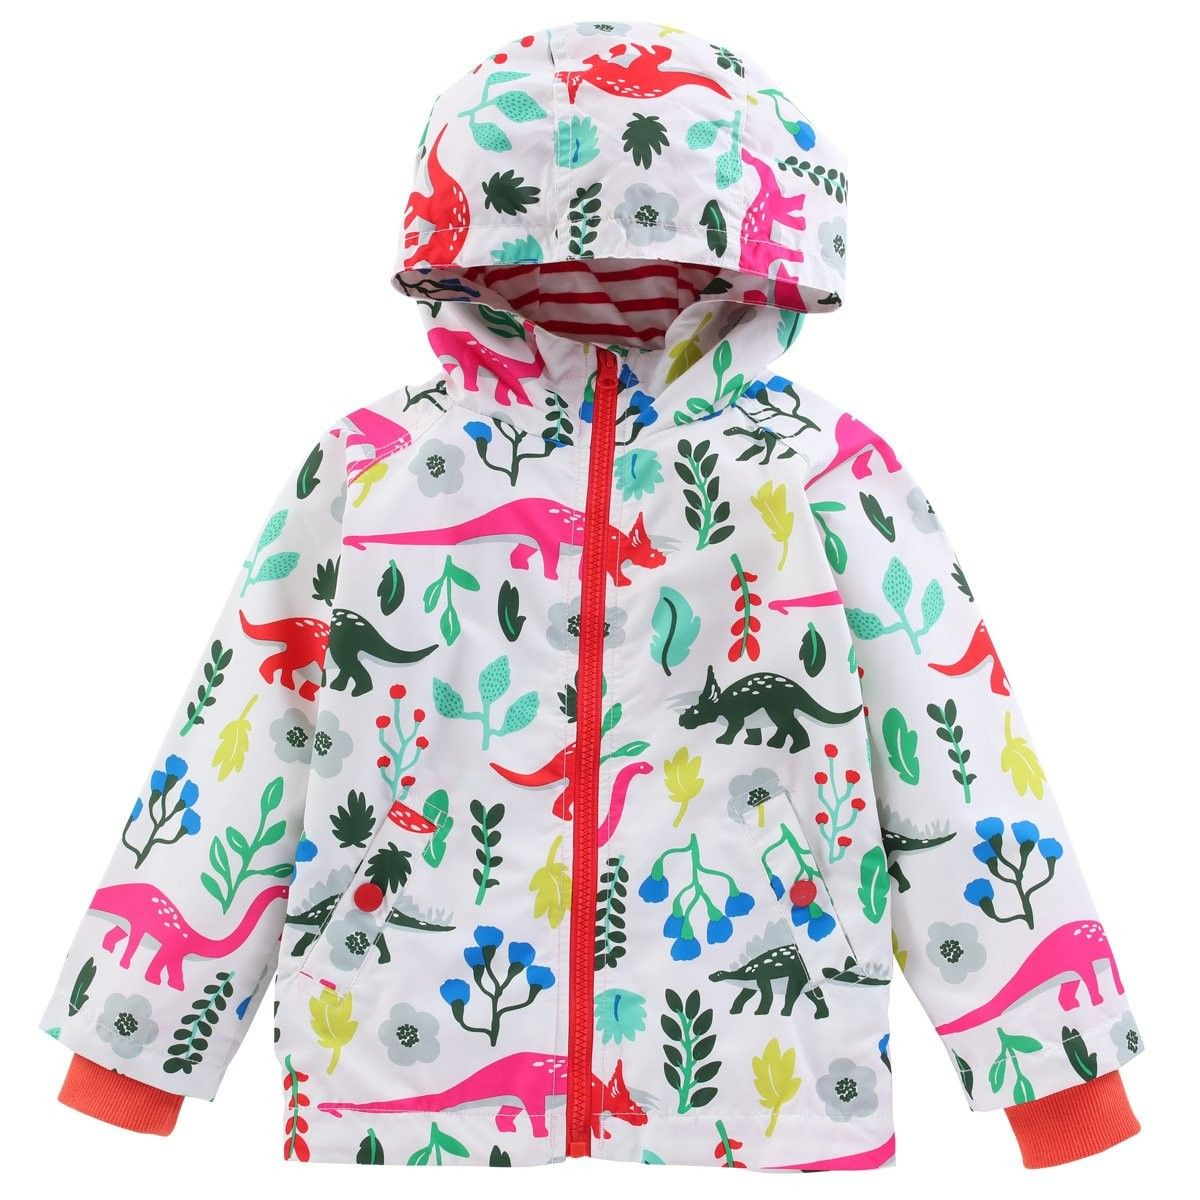 Girls Hoodie Jacket Outdoor Windproof Outerwear White Ce18m7kqydh Kids Outerwear Waterproof Hooded Jacket Hoodie Girl [ 1200 x 1200 Pixel ]